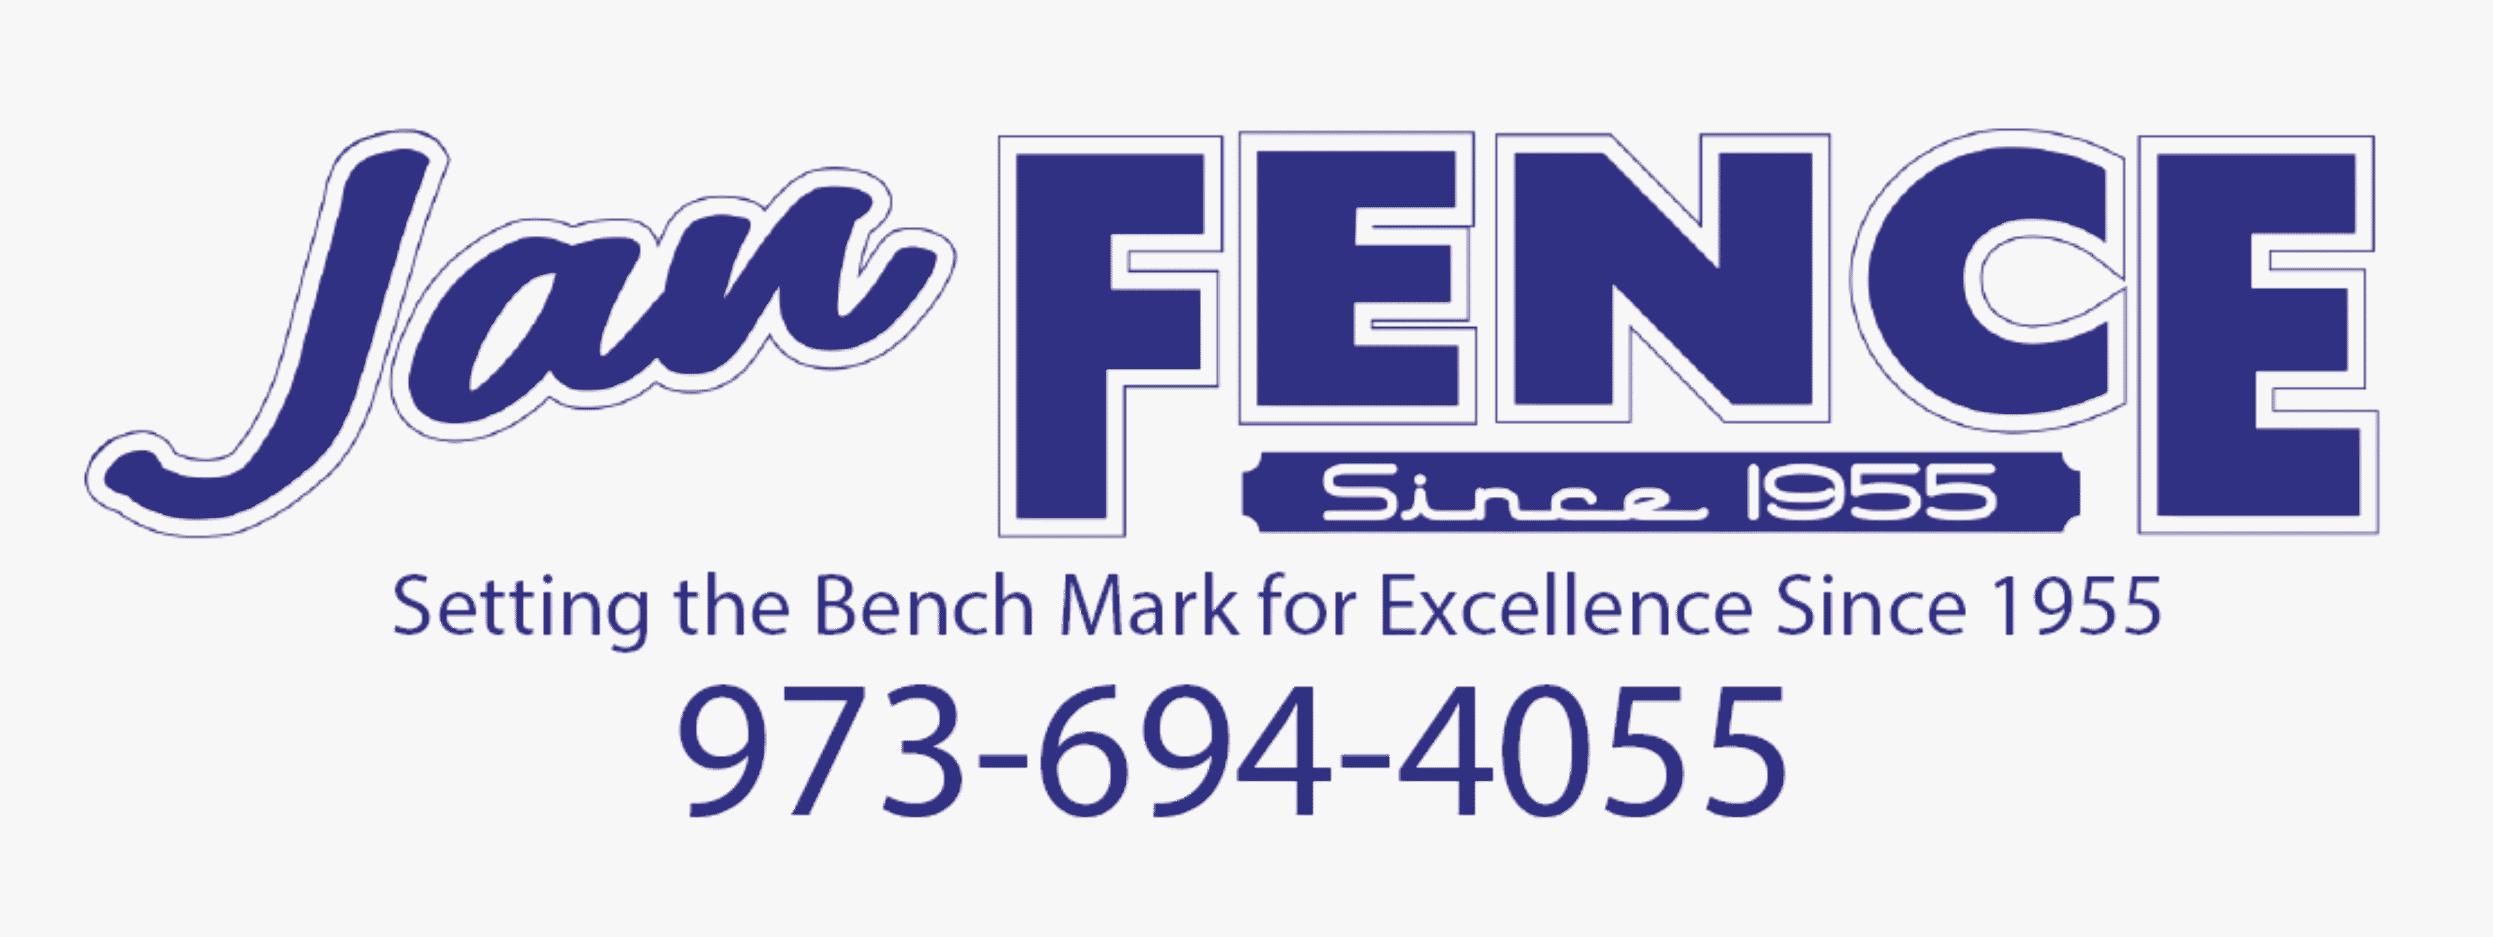 Jan Fence